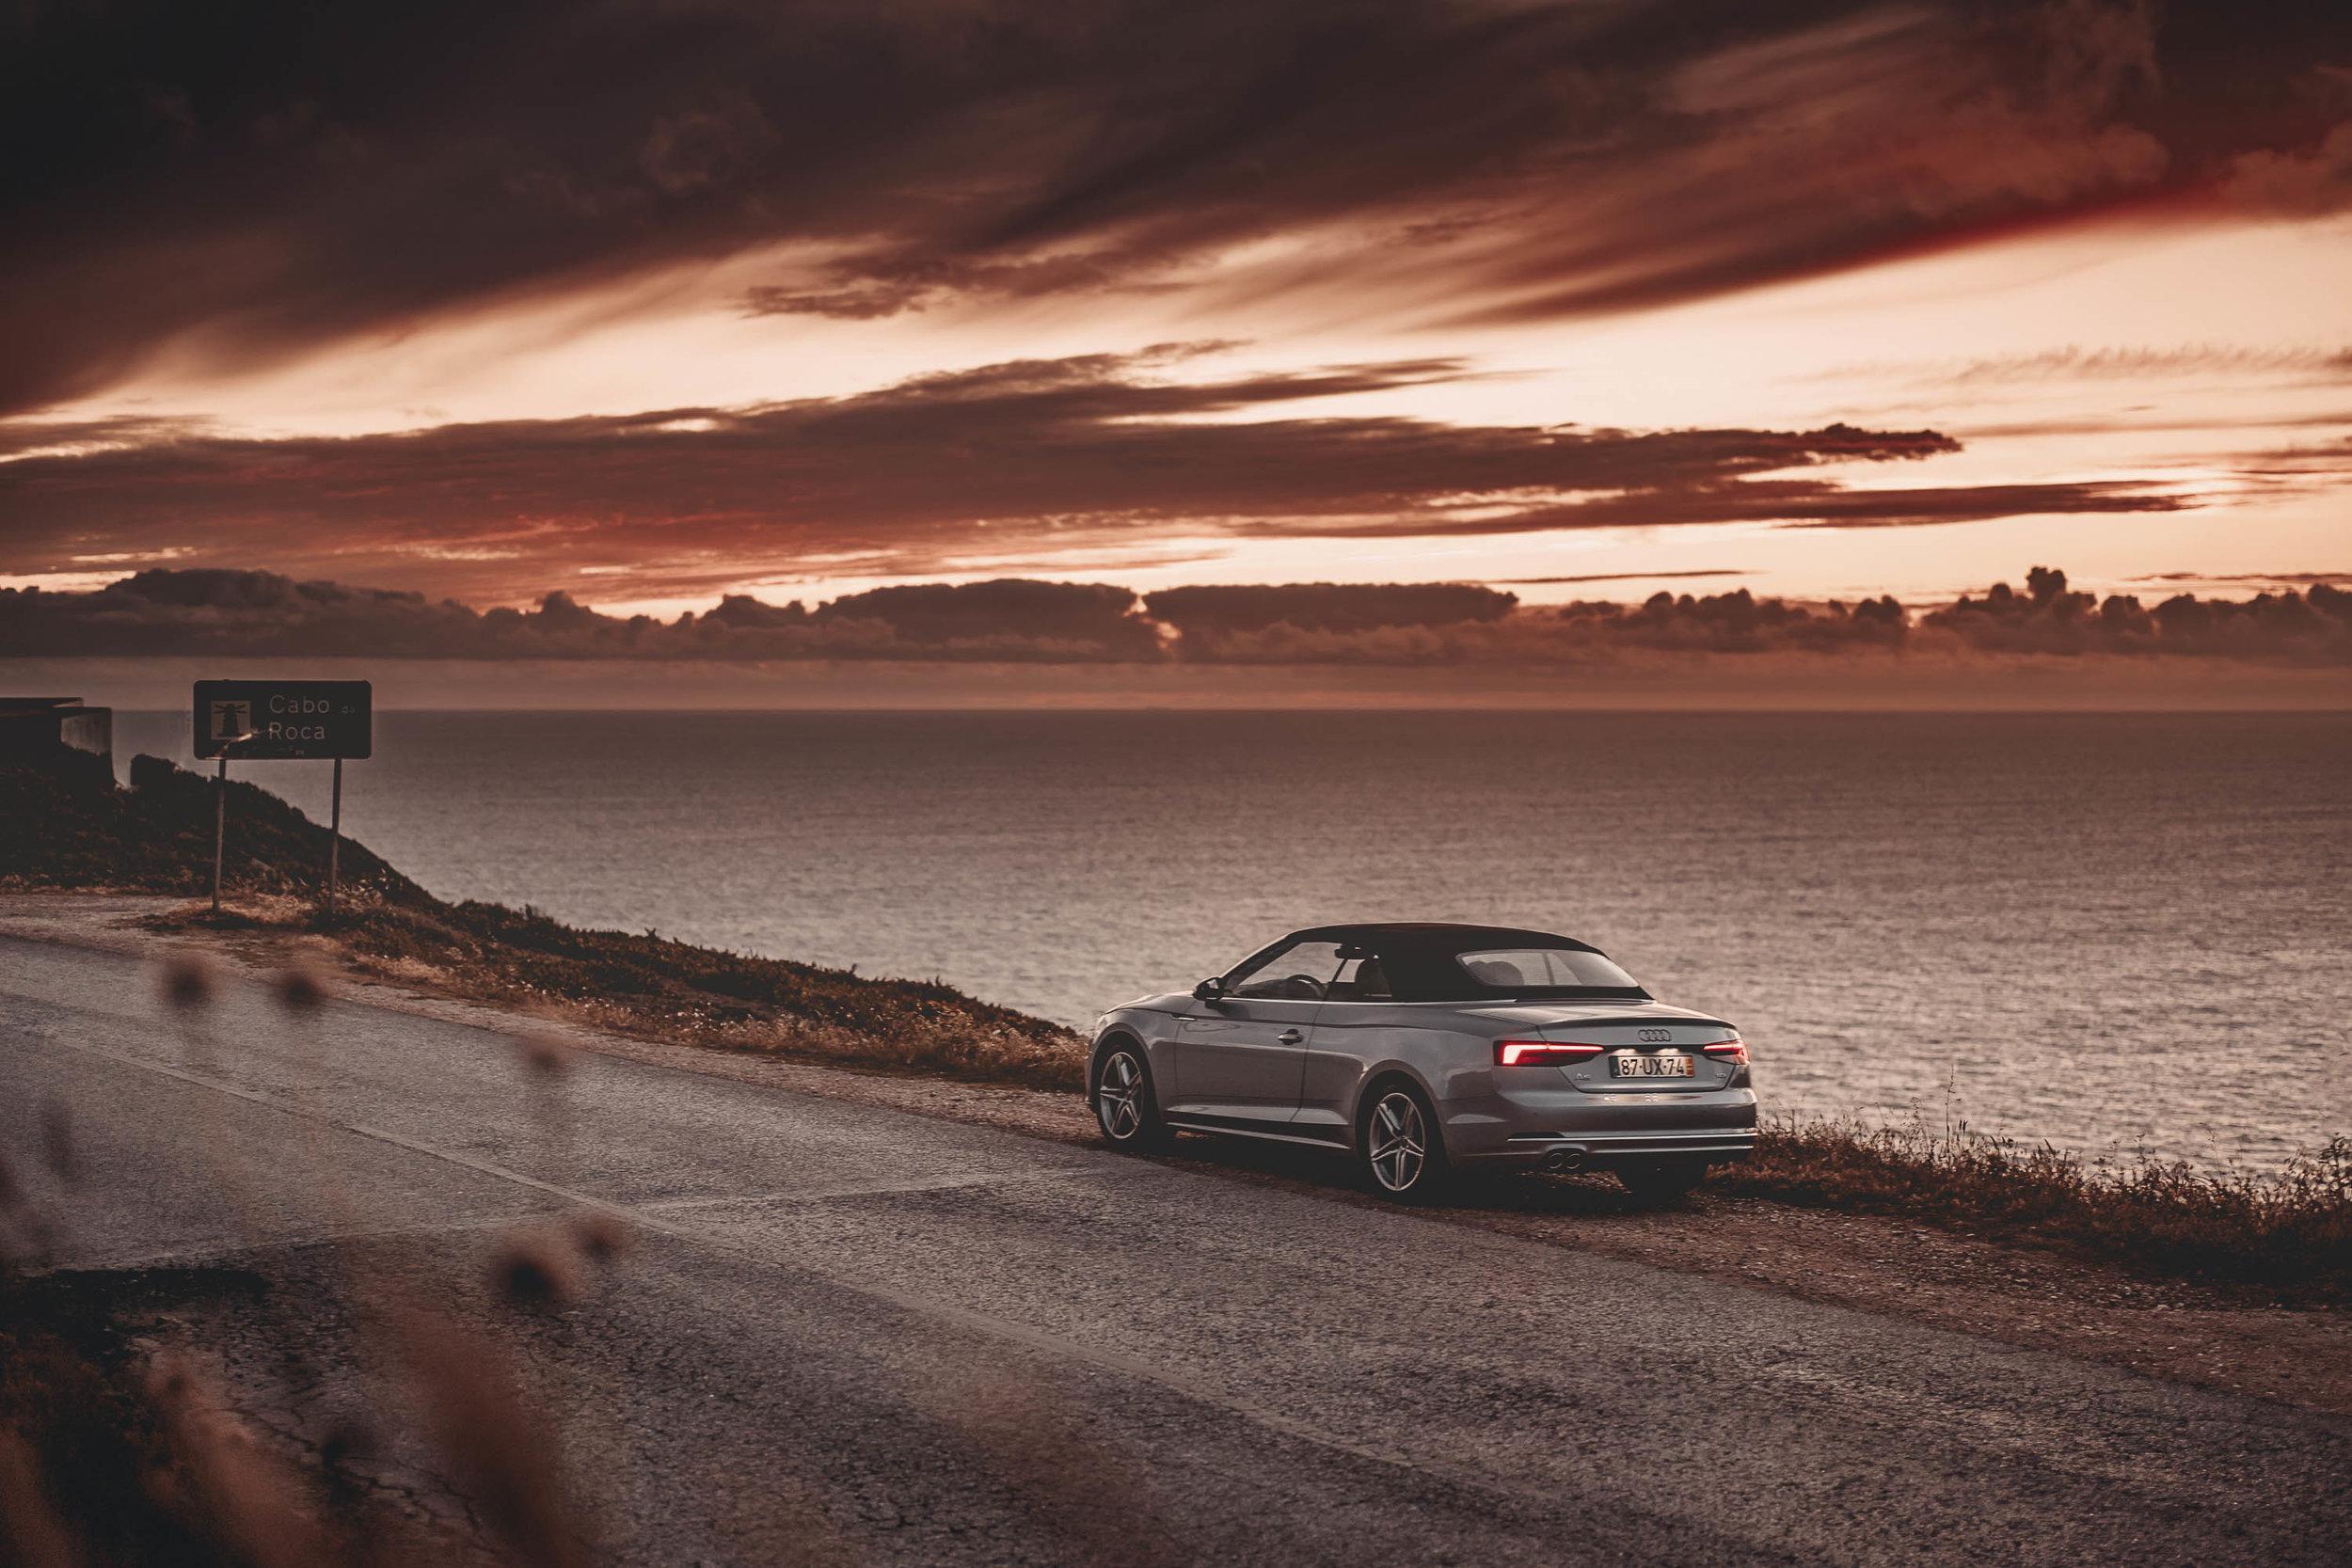 Maximilian_Otto_Audi_A5_Cabriolet_Portugal_02_WEB.jpg